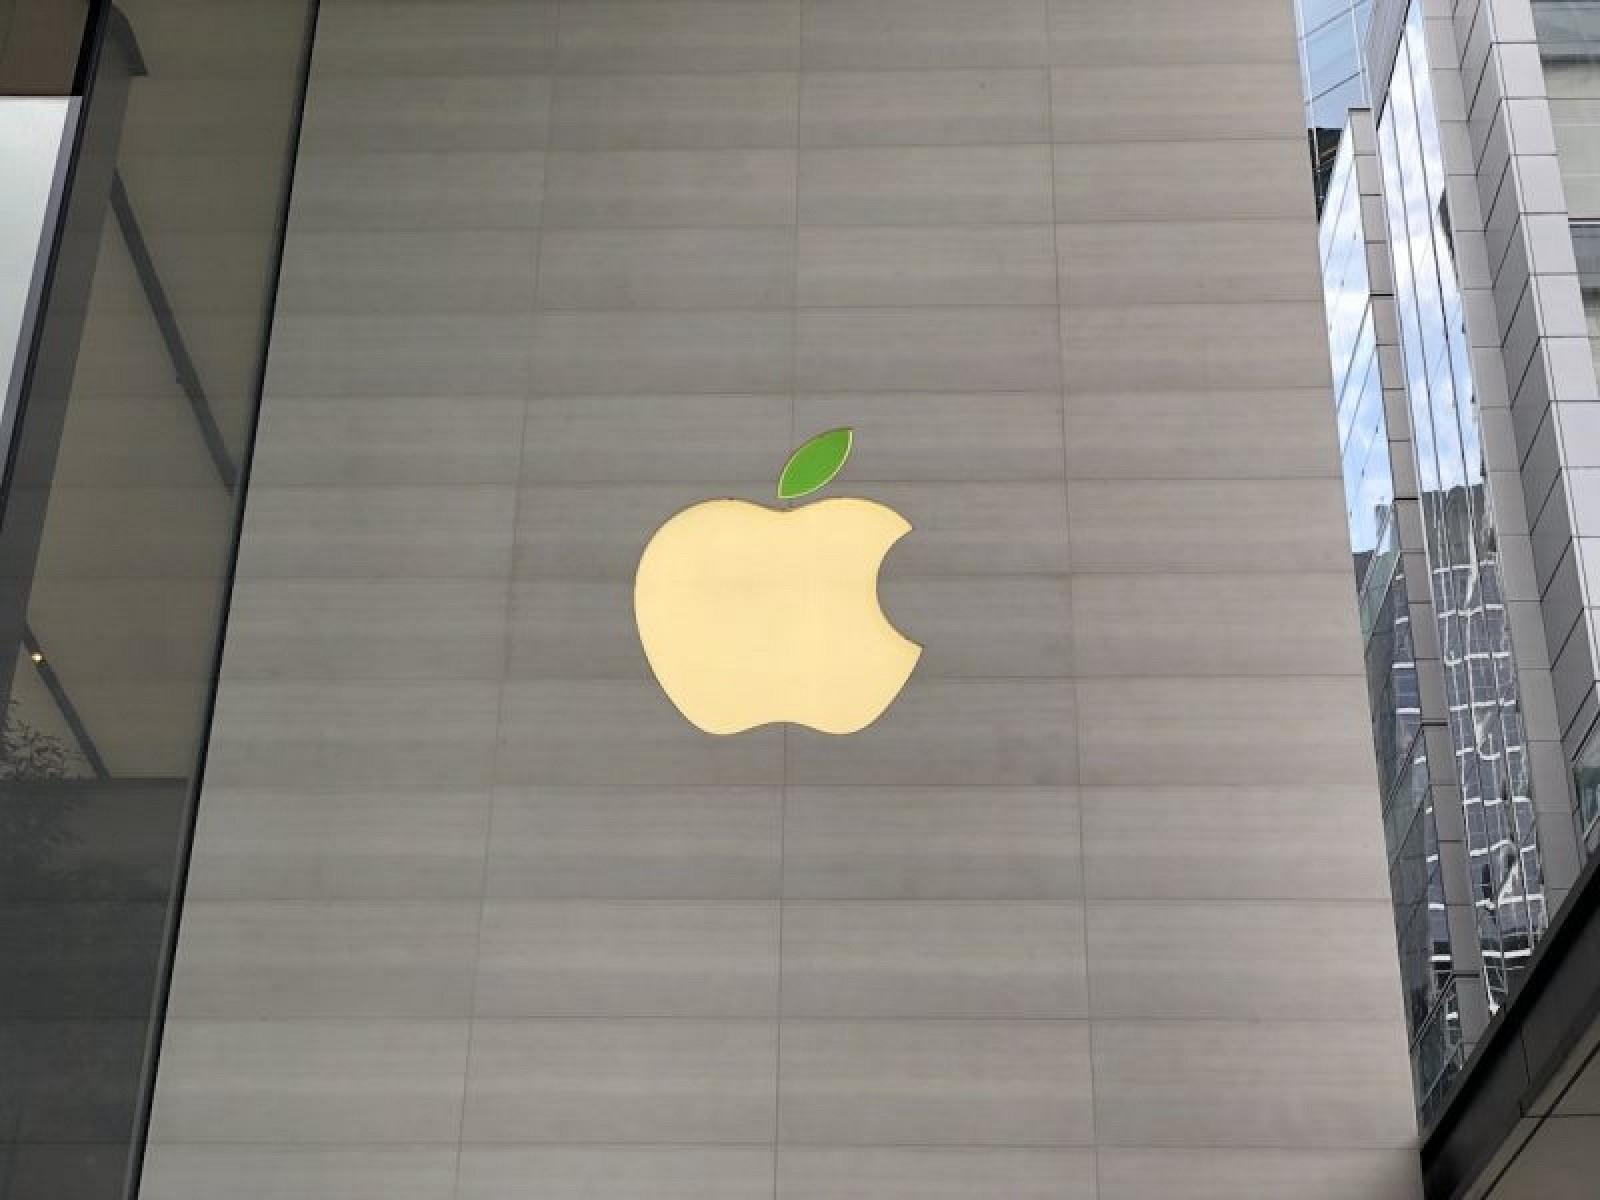 Loog de Apple con la hoja verde en la Apple Store de Orchard Road, Singapur (imagen de Stanford Chong)